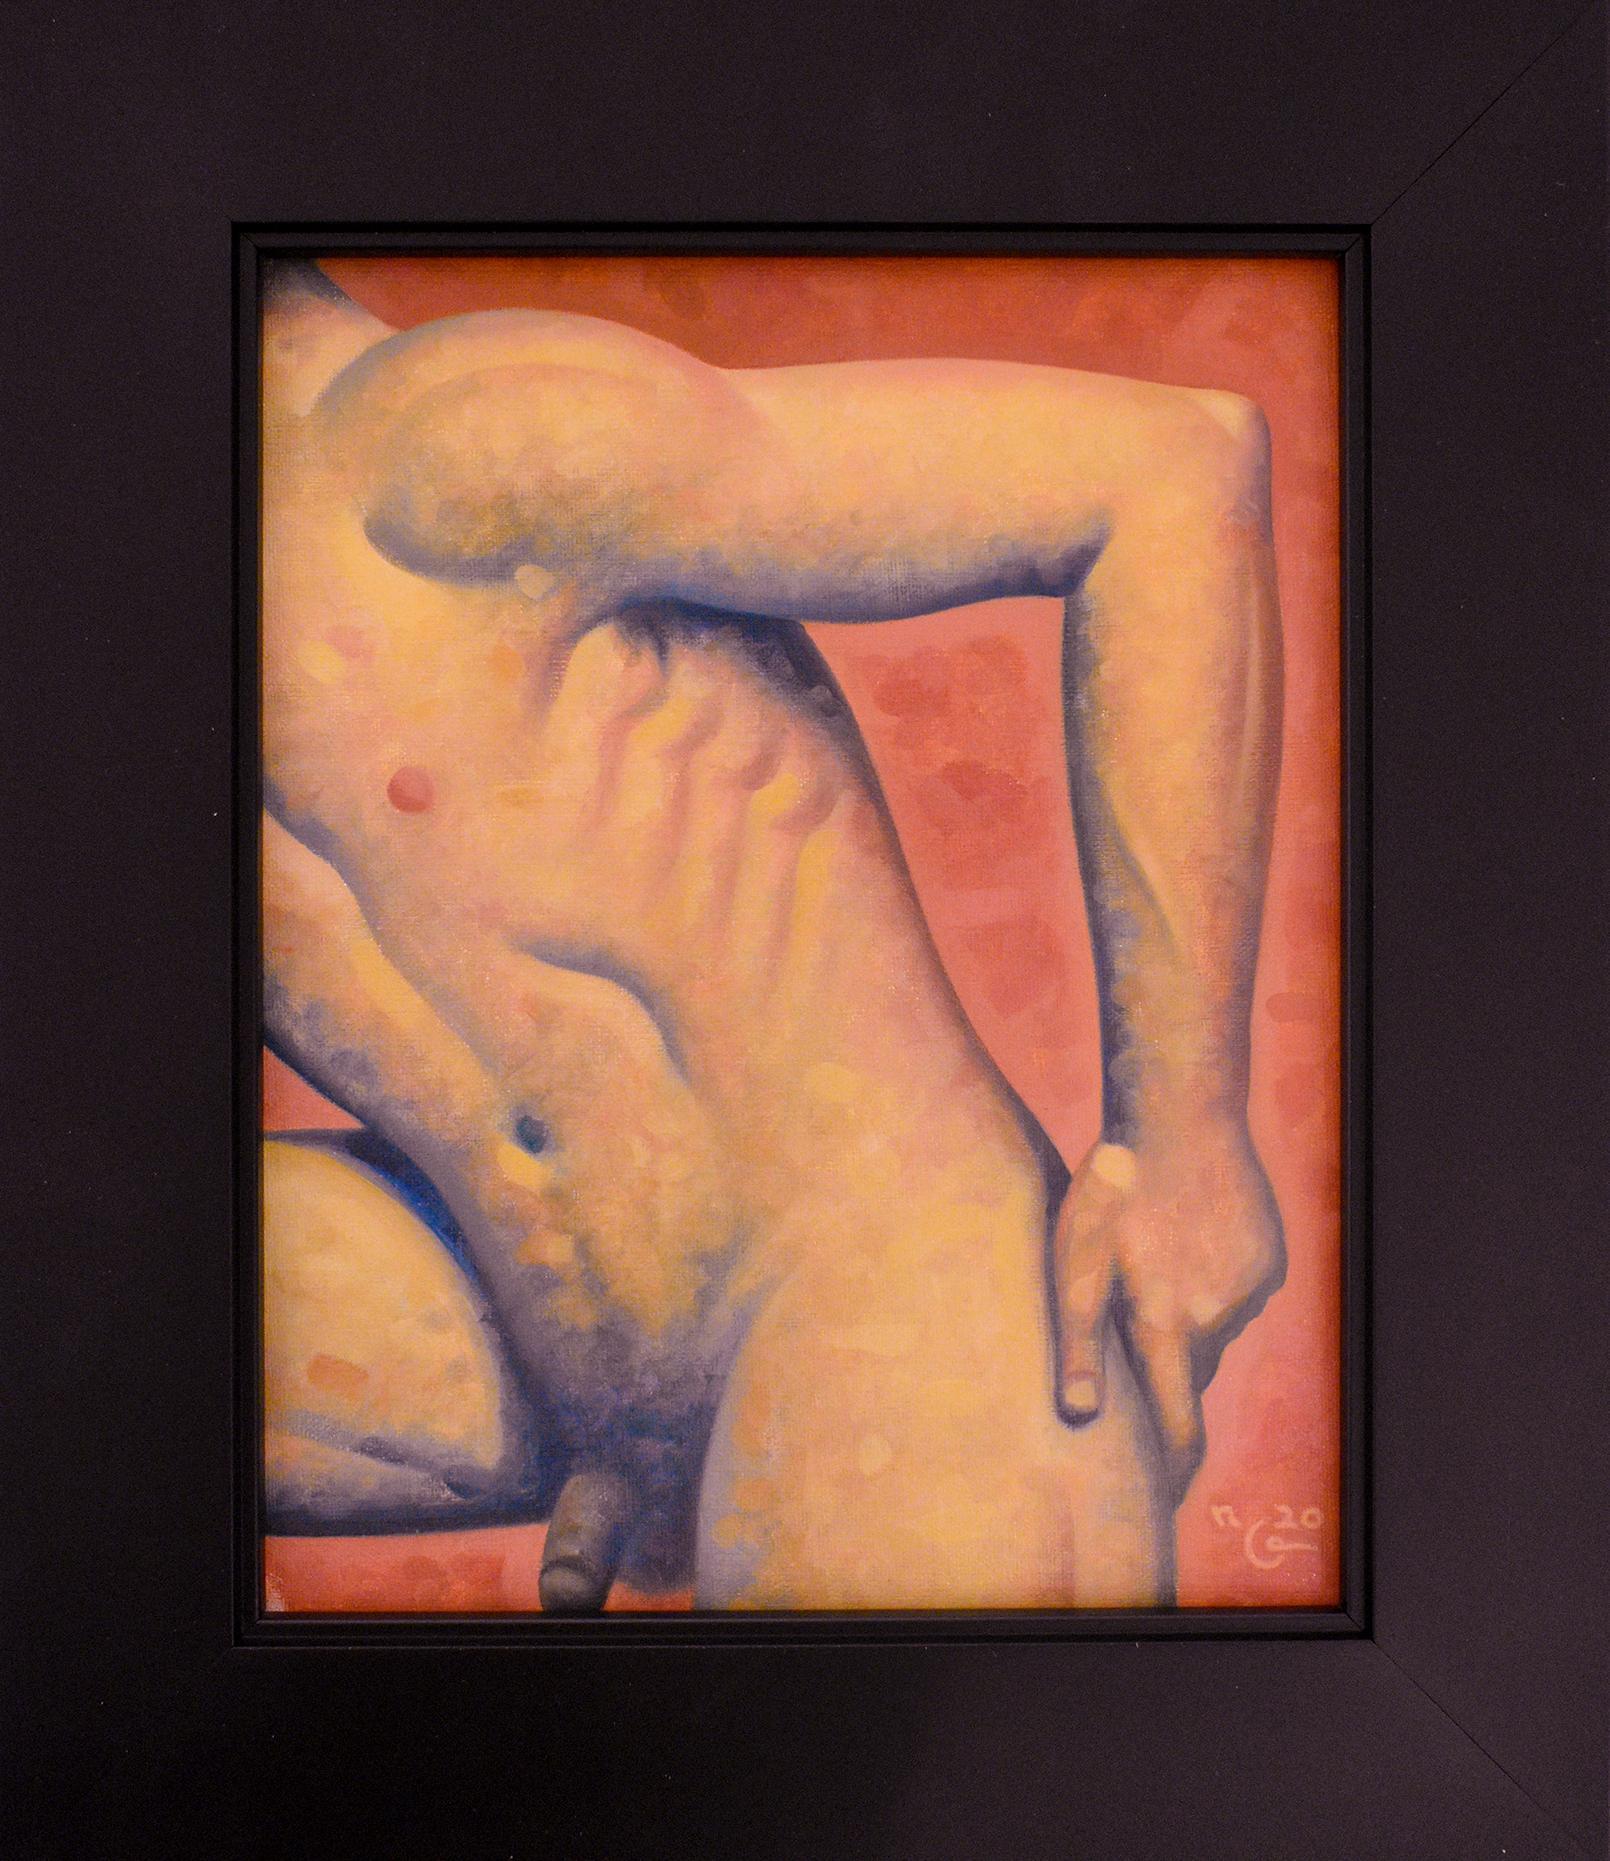 Anatomy No. 45 (Figurative Painting of Male Nude on Blood Orange)